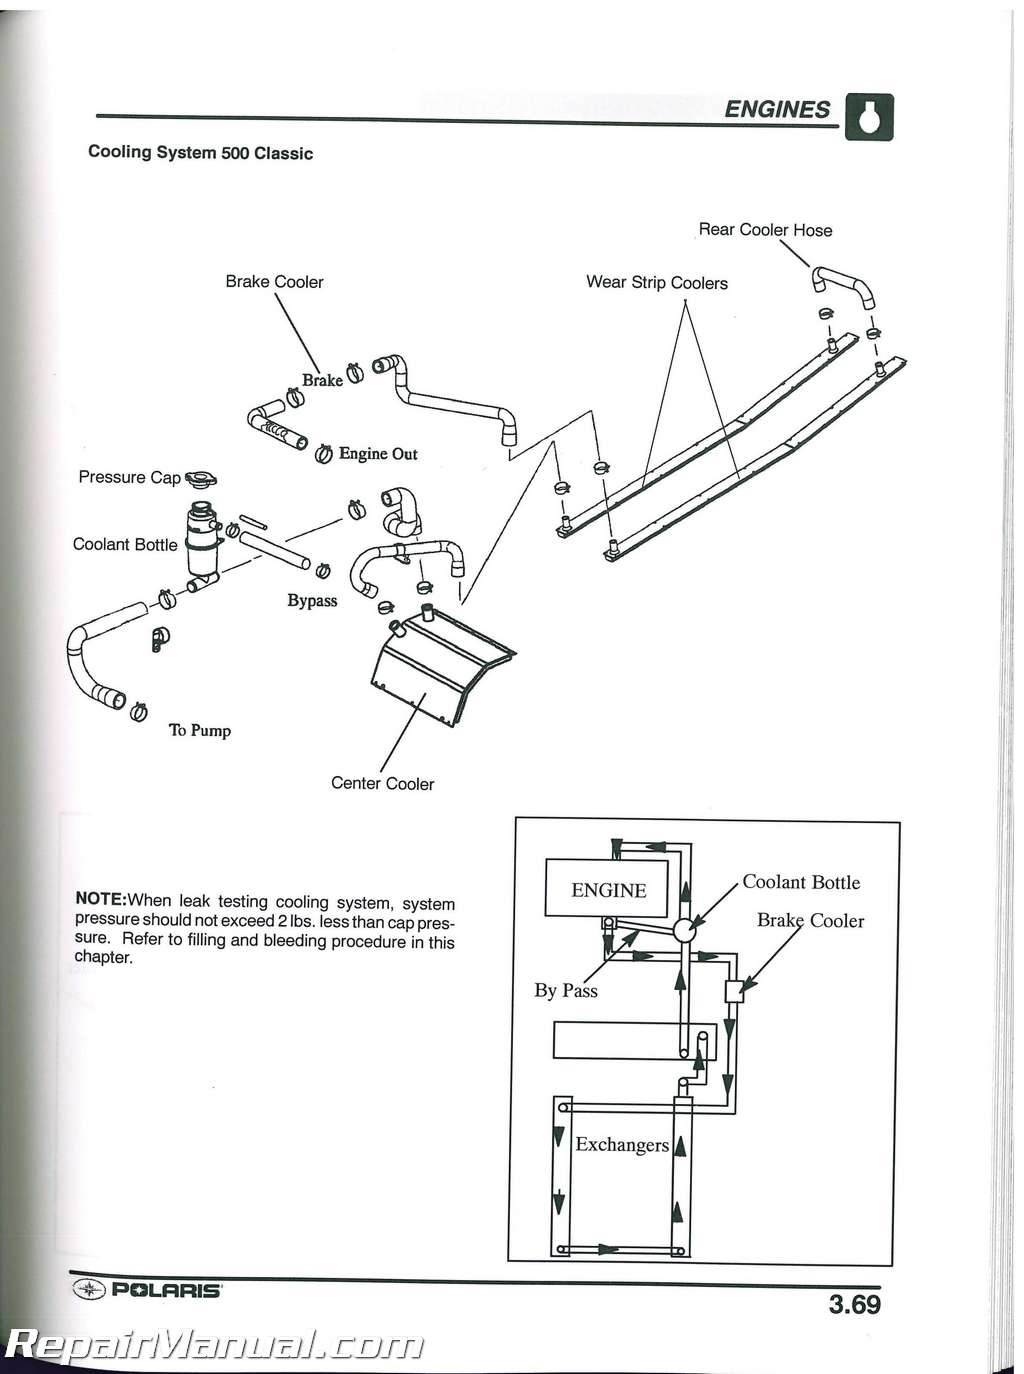 hight resolution of  diagrams 2005 2003 polaris 500 clic 550 600 700 clic edge snowmobile service